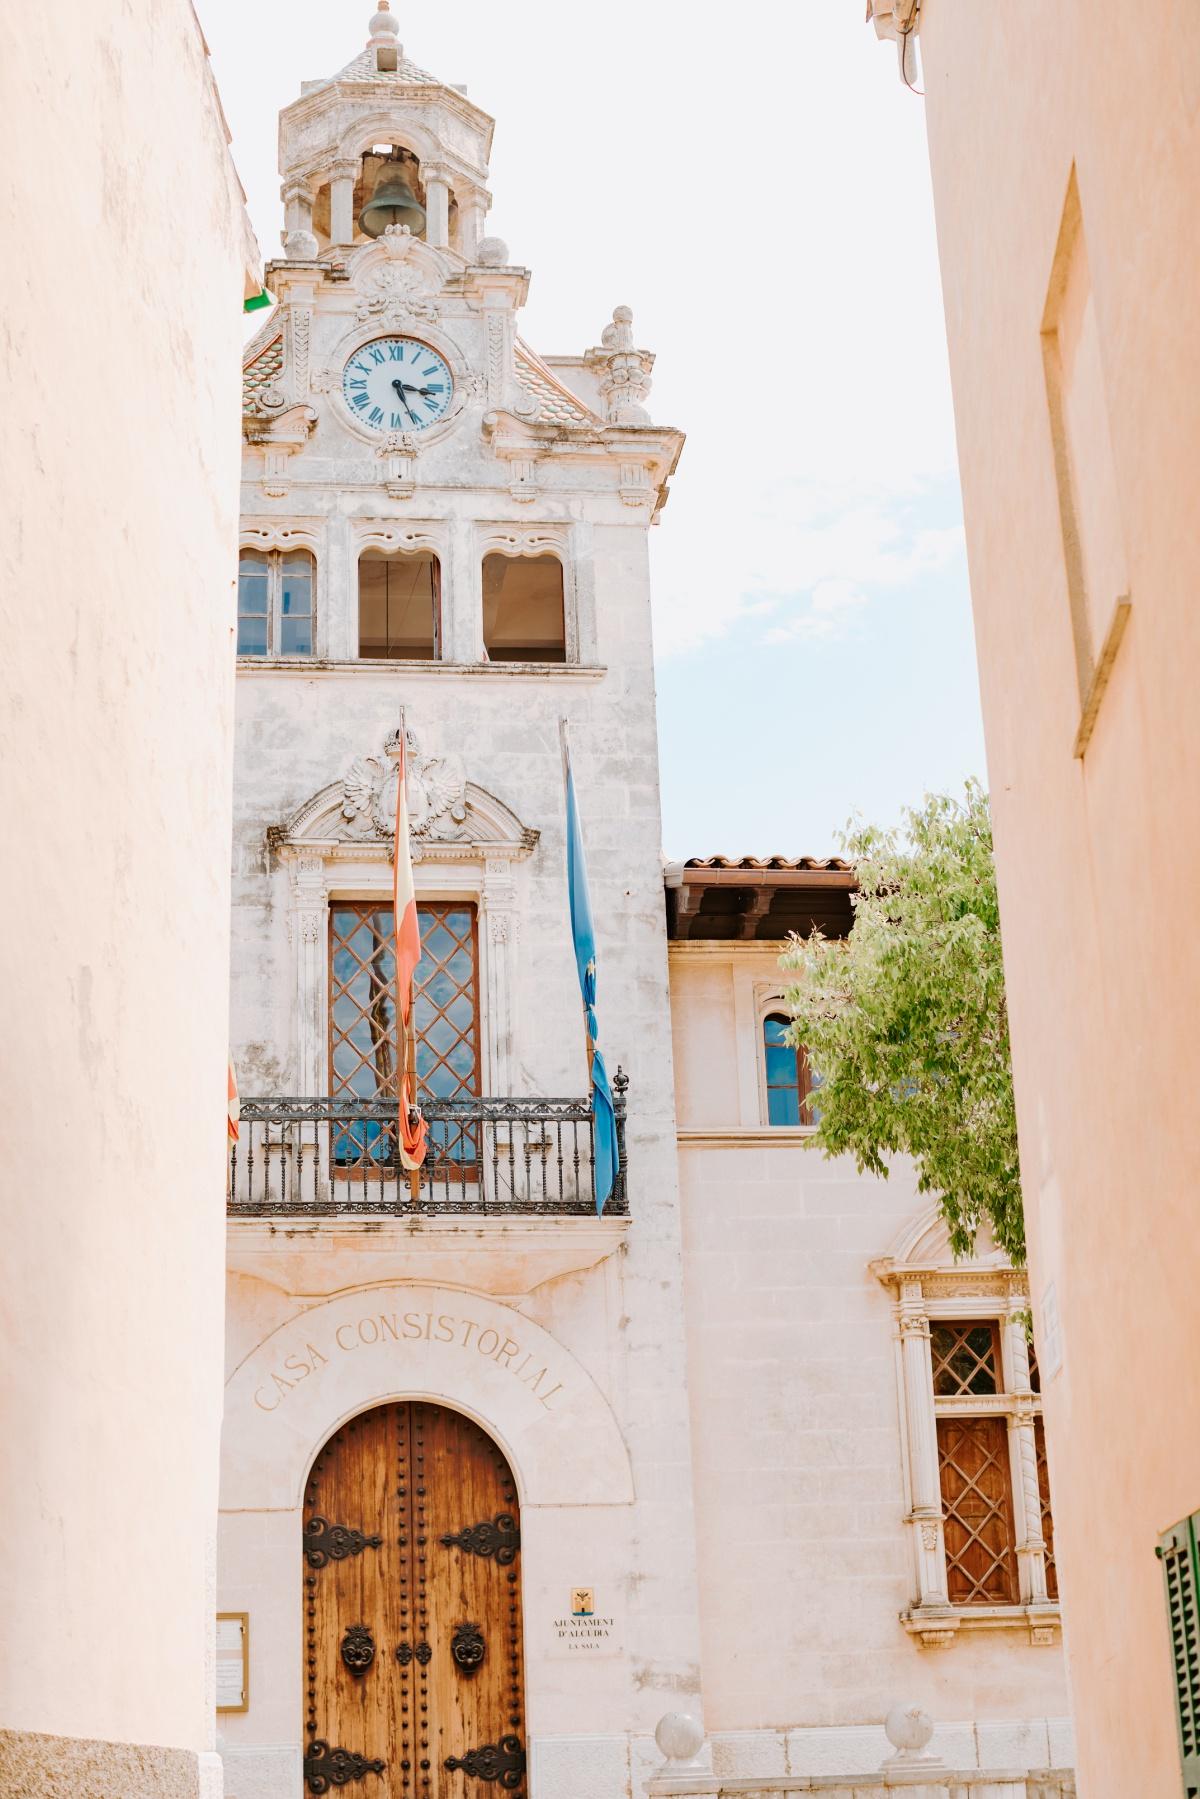 Government building in Alcudia